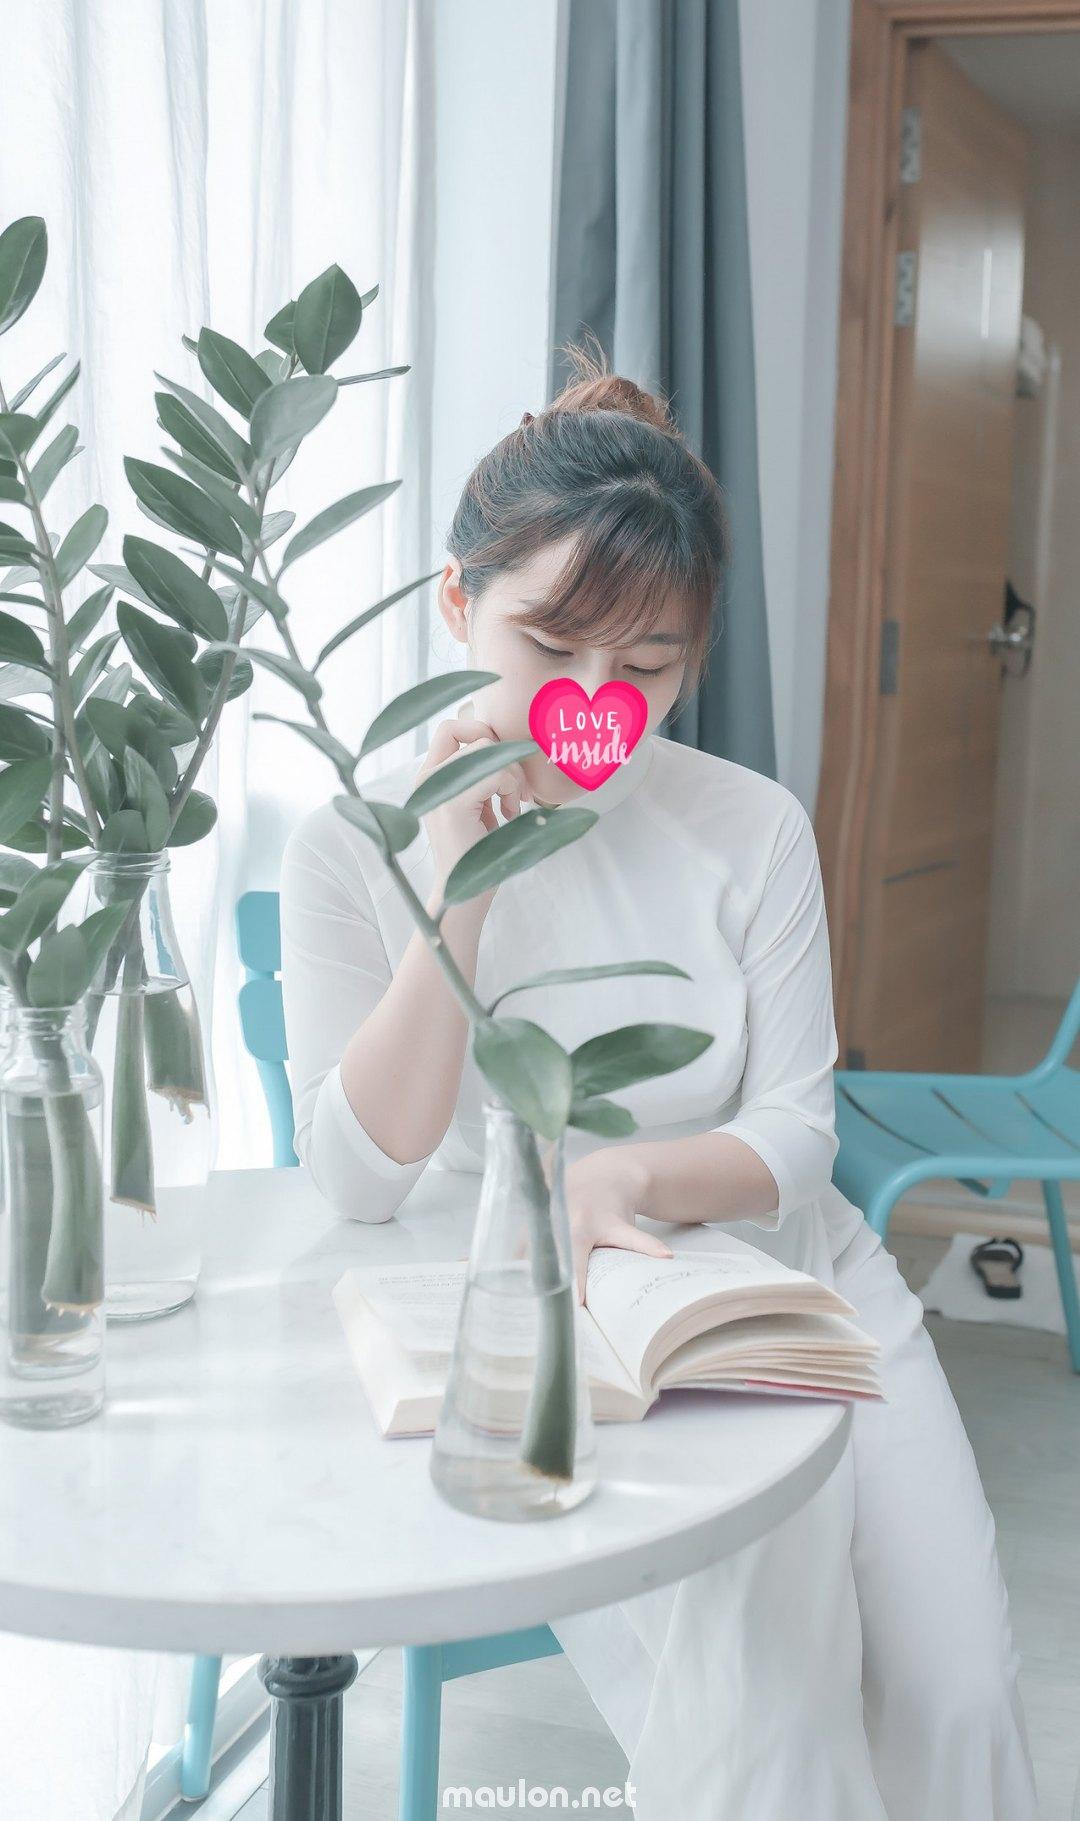 MauLon.Net - Ảnh sex Em sinh viên 2k khoe dáng đẹp